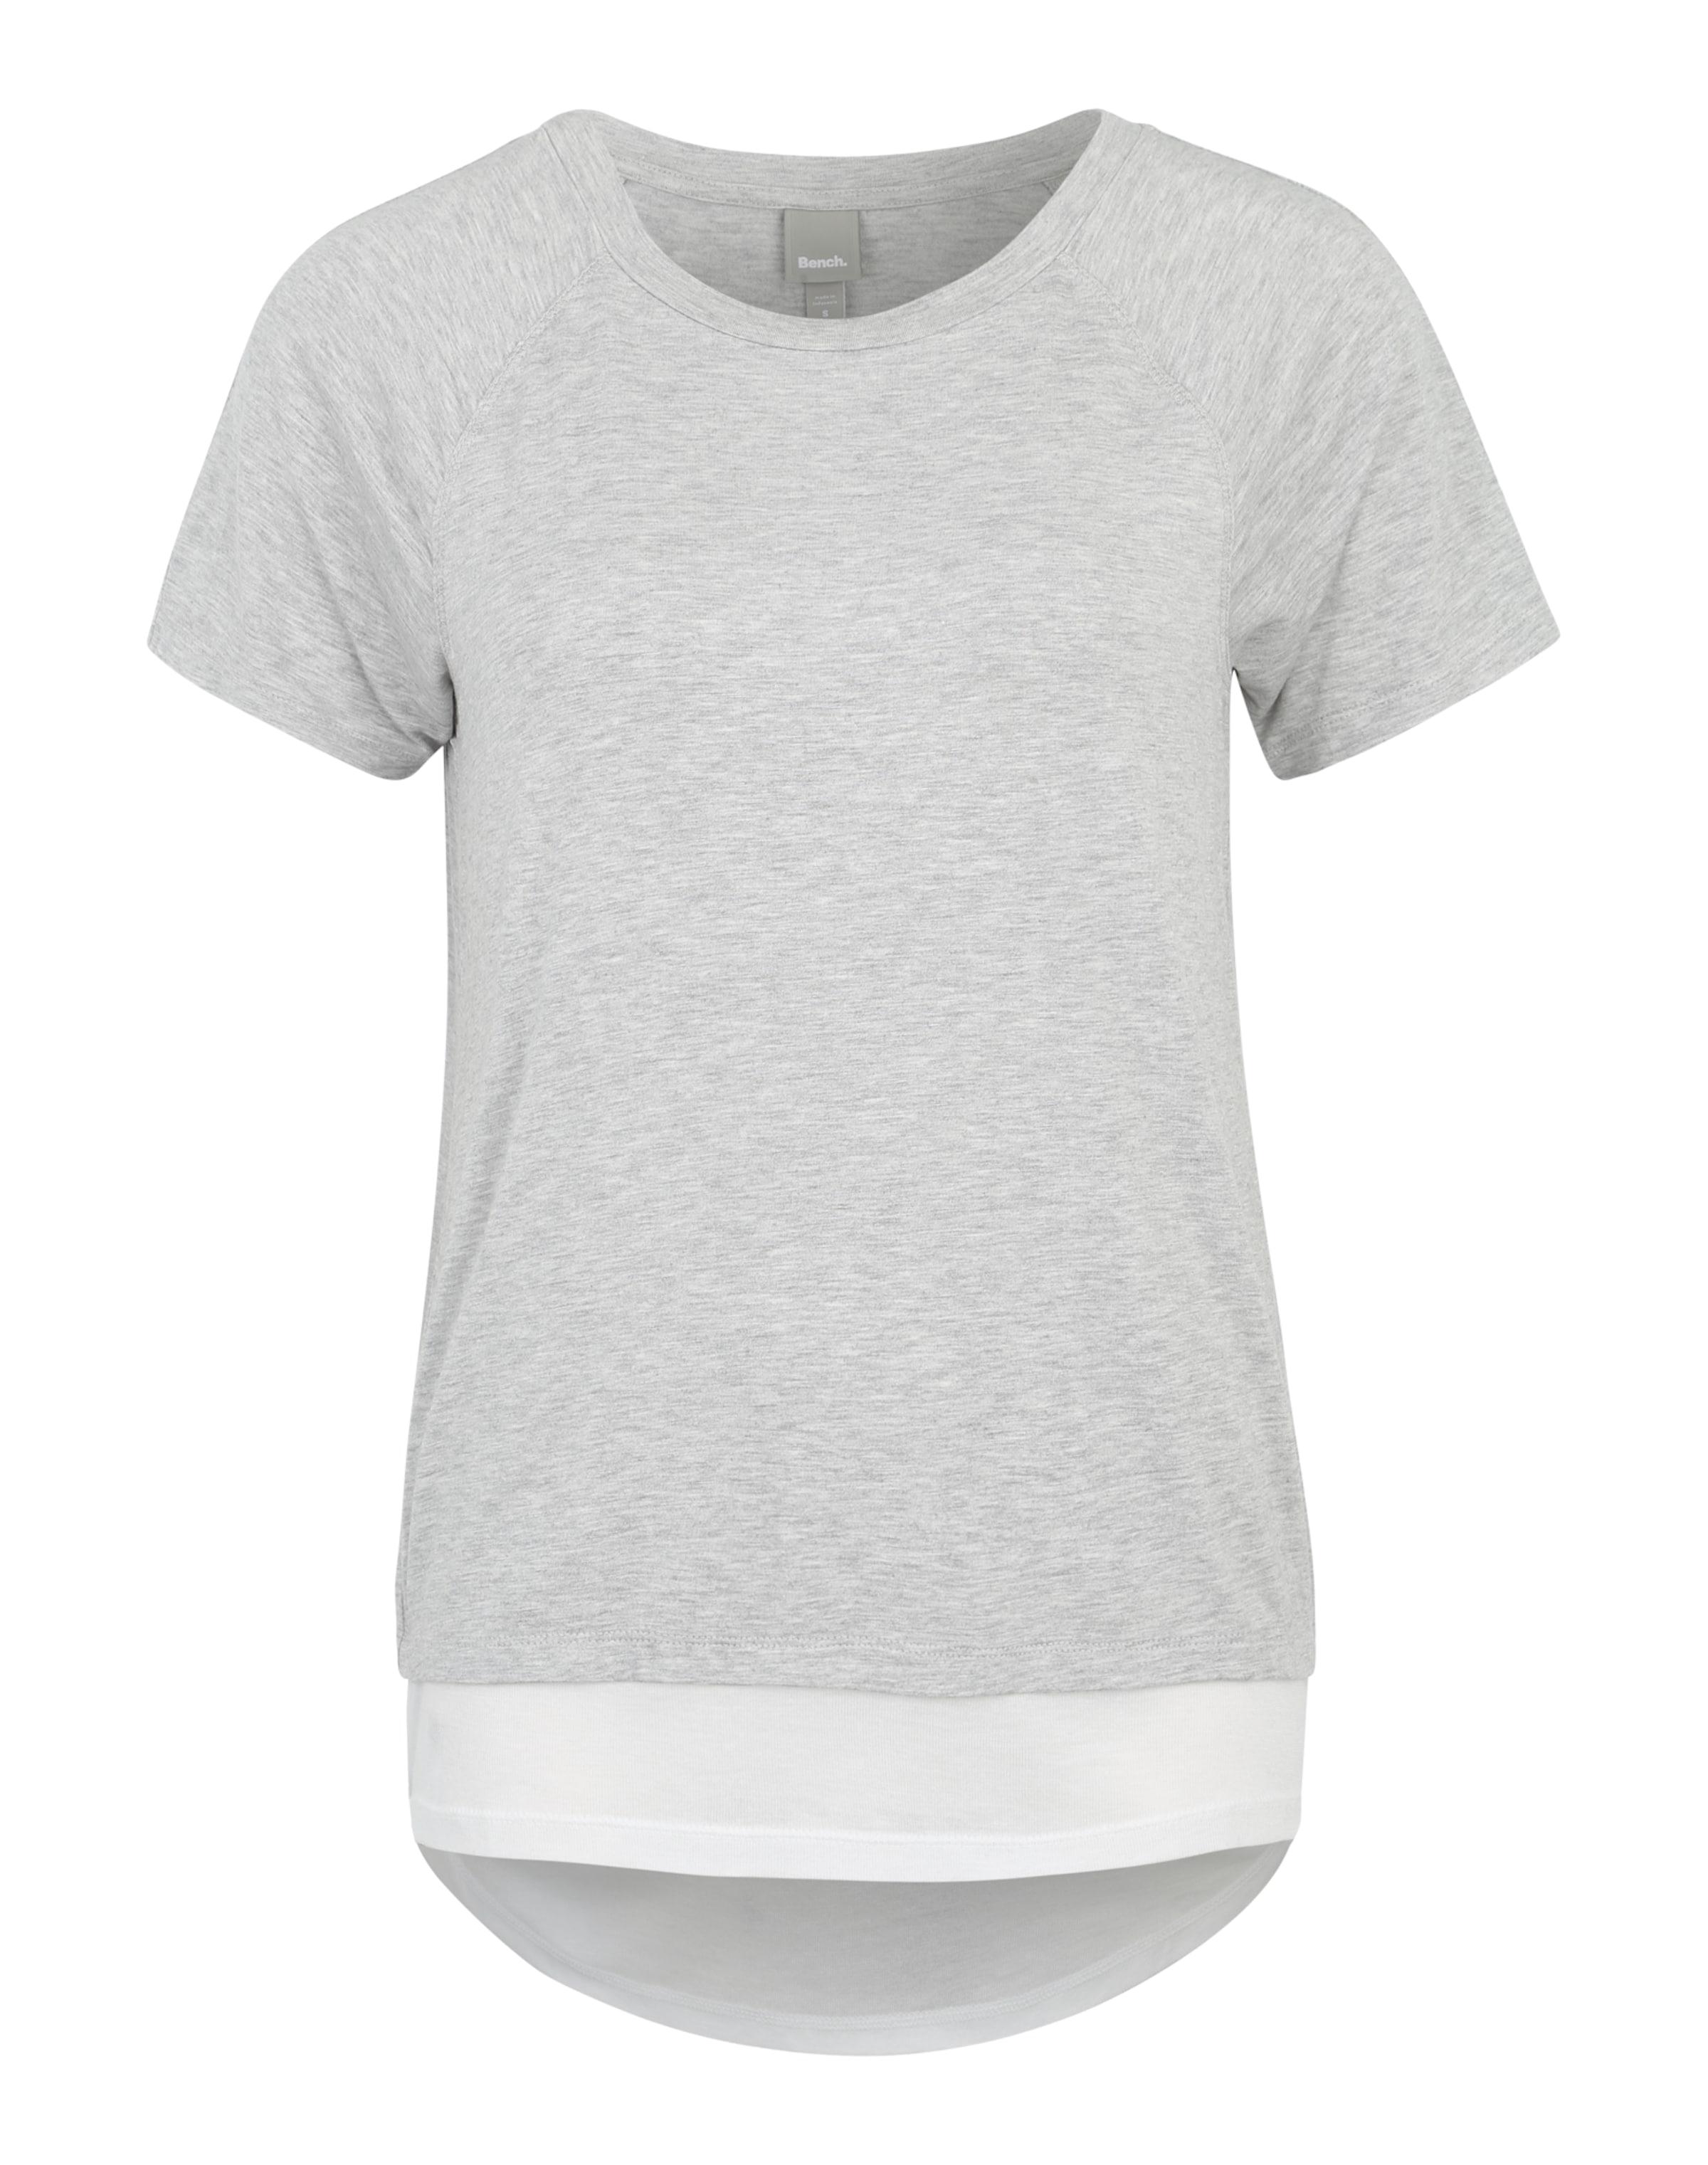 BENCH Shirt in Melange-Optik Rabatt 2018 Outlet Kollektionen voT8n3